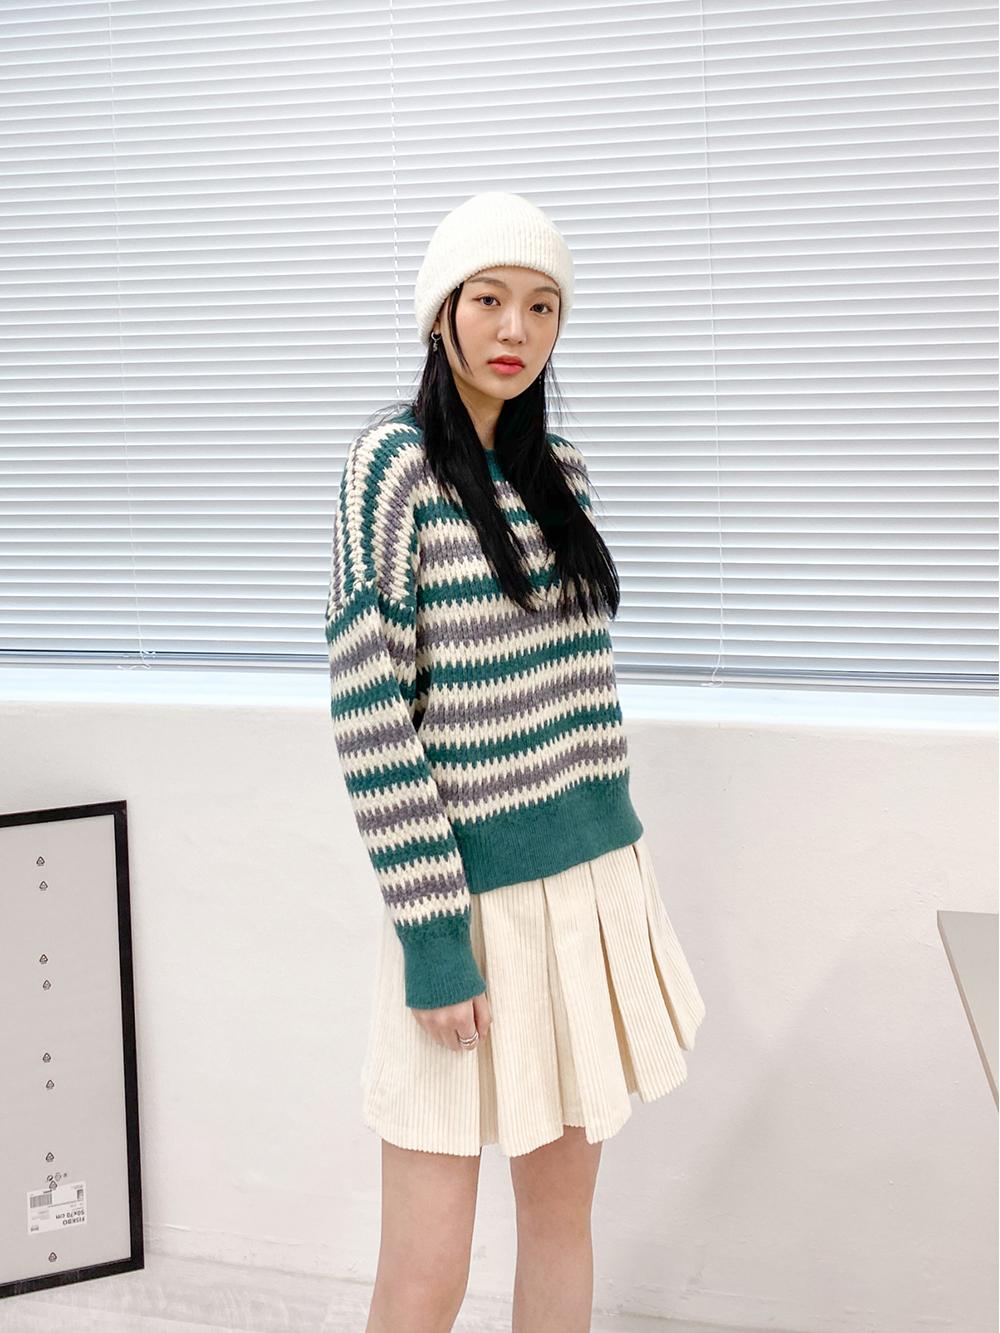 Burning Round Striped Knitwear